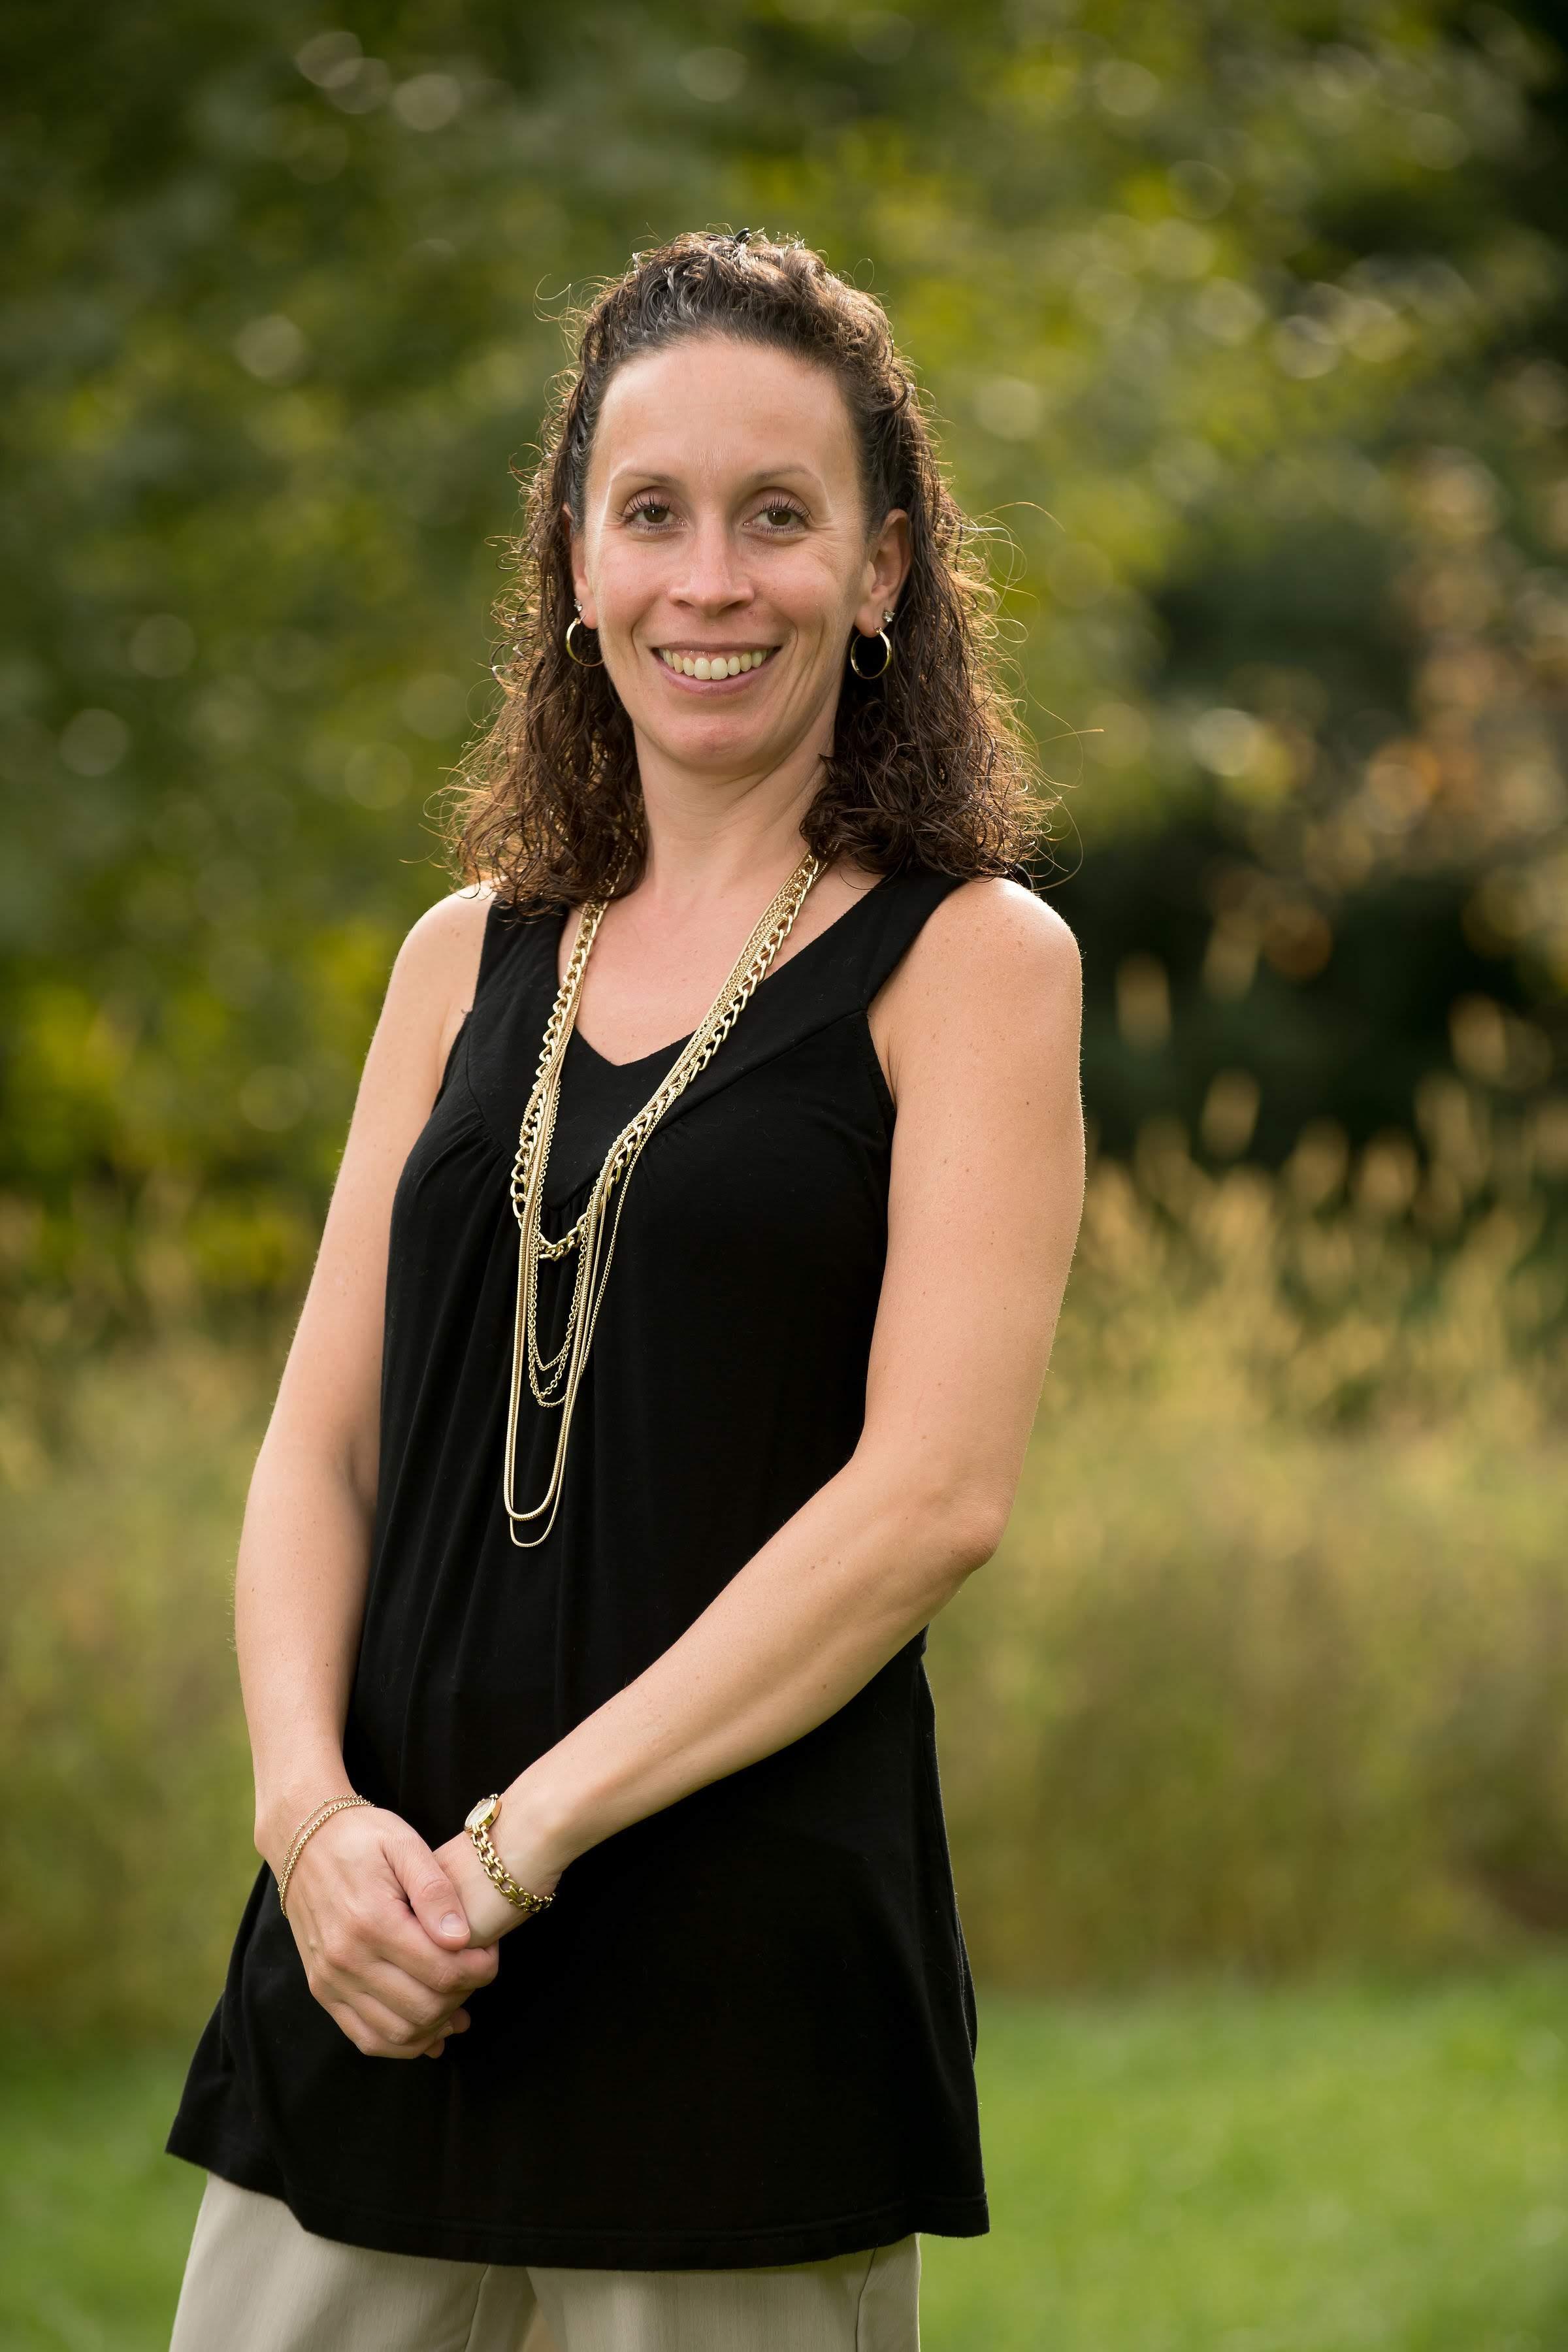 Pine Cobble School Business Manager-Christy St. John